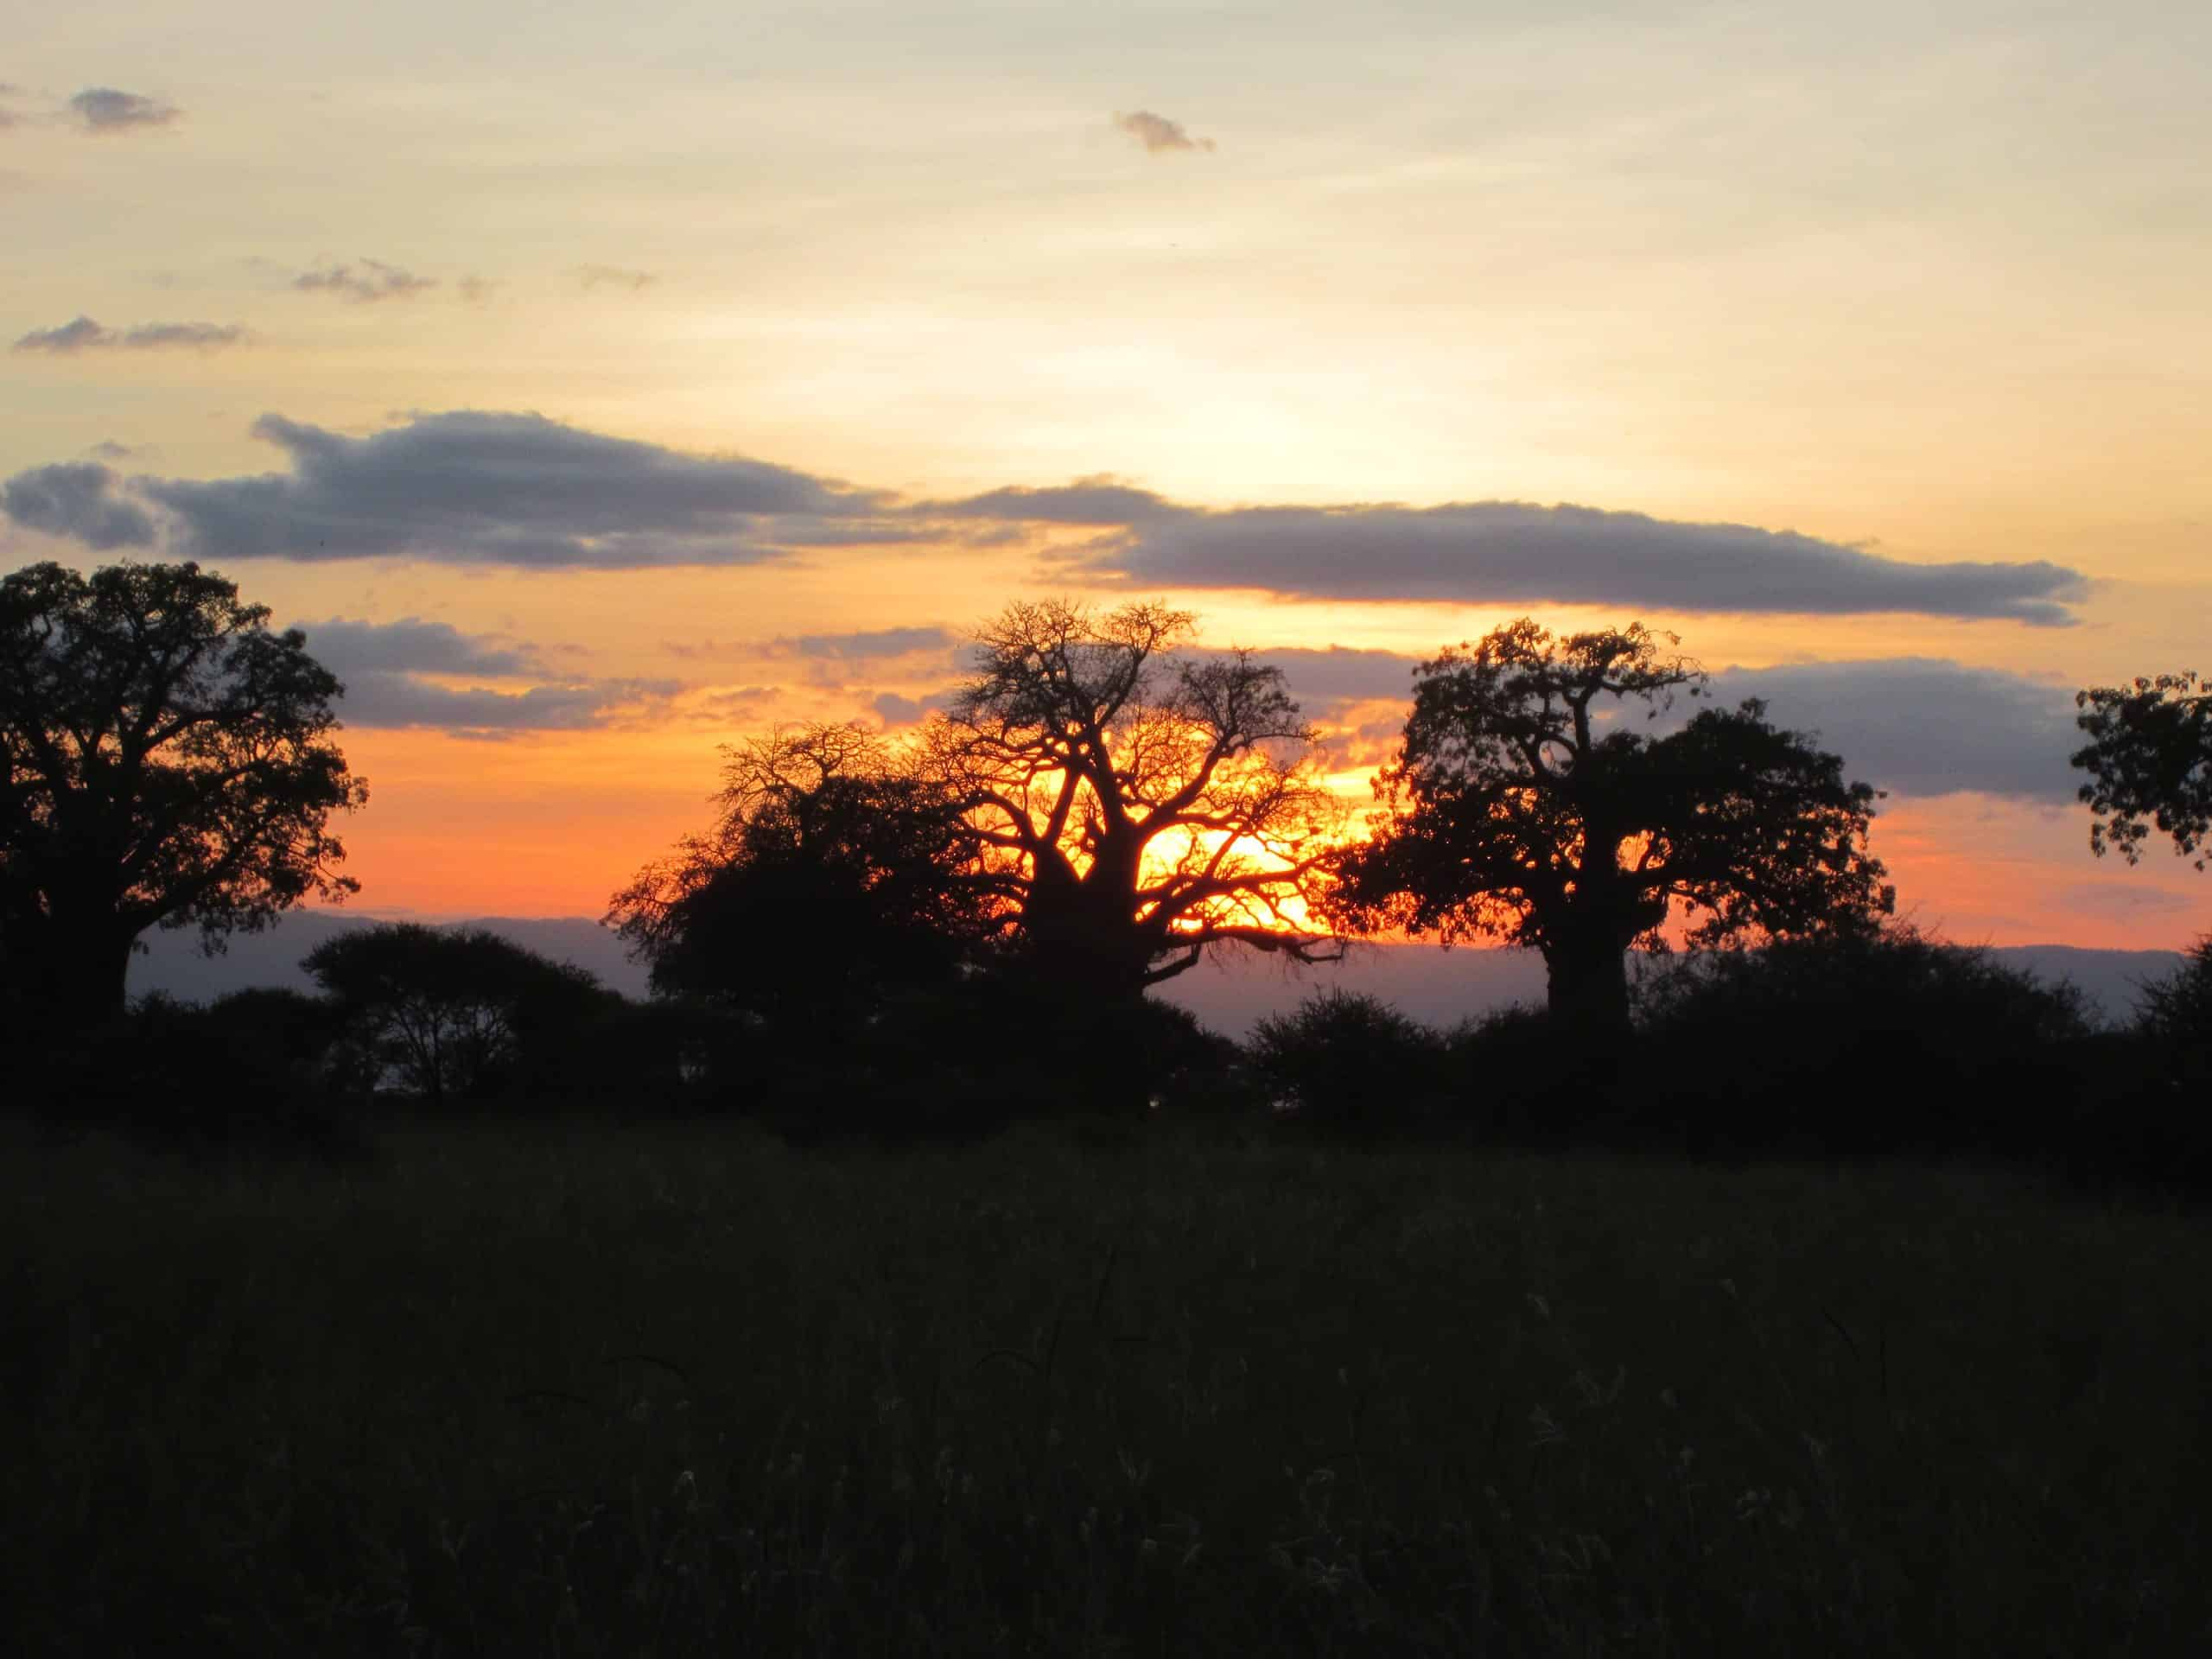 8 Day Tanzania Adventure Safari #2